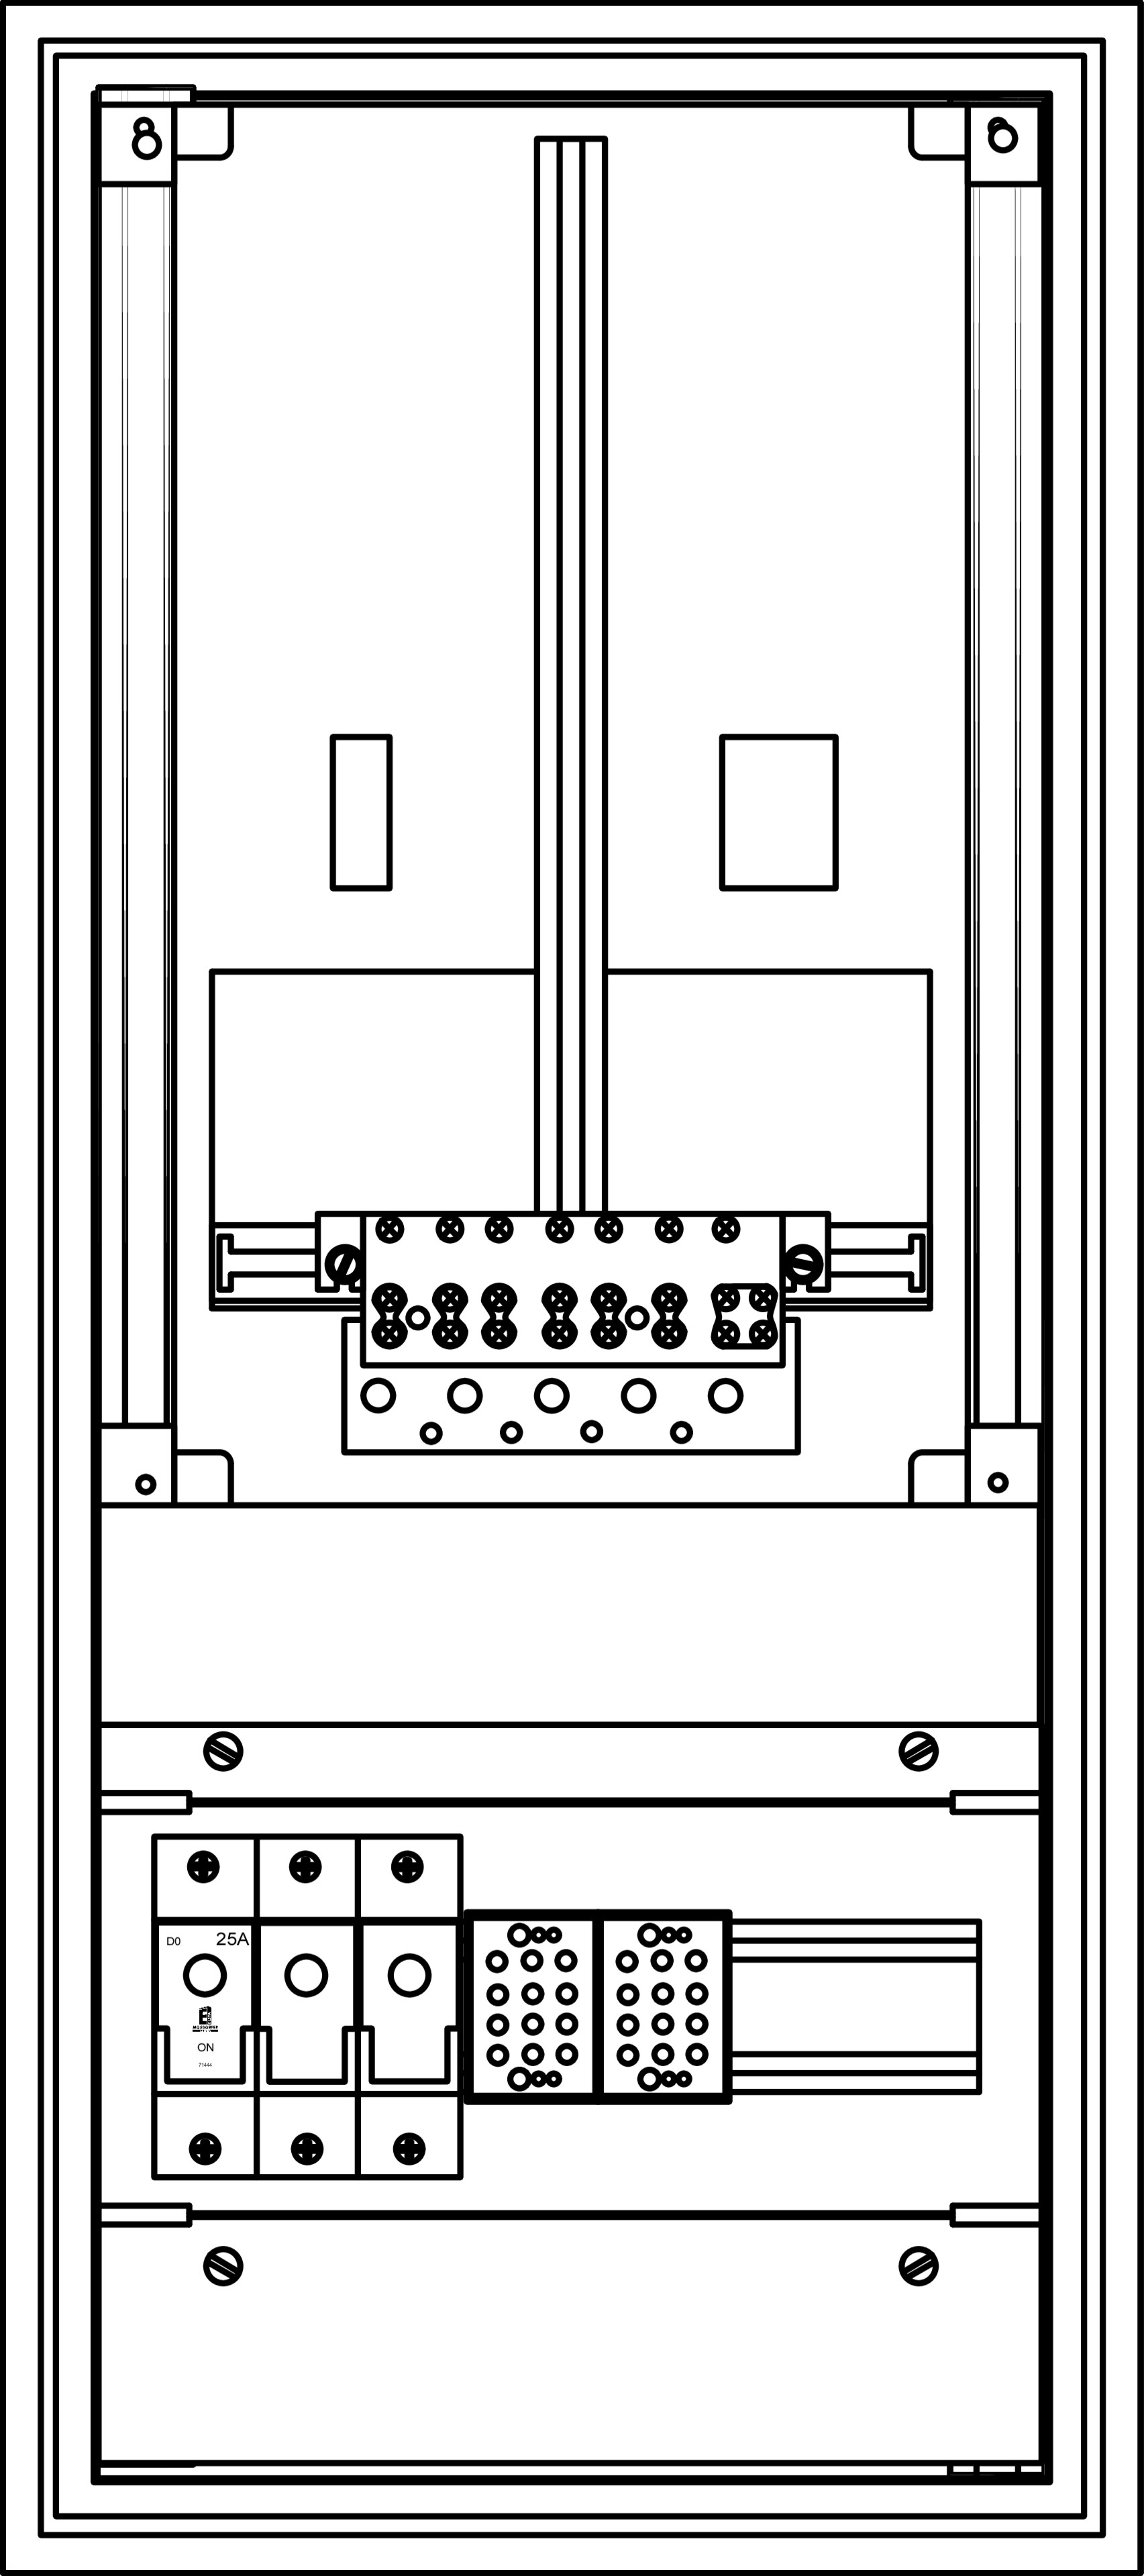 1 Stk KST.Zählervert.1 ZP, 1 Gerätefeld unten 12TE, 61005-Sp. IG714124--